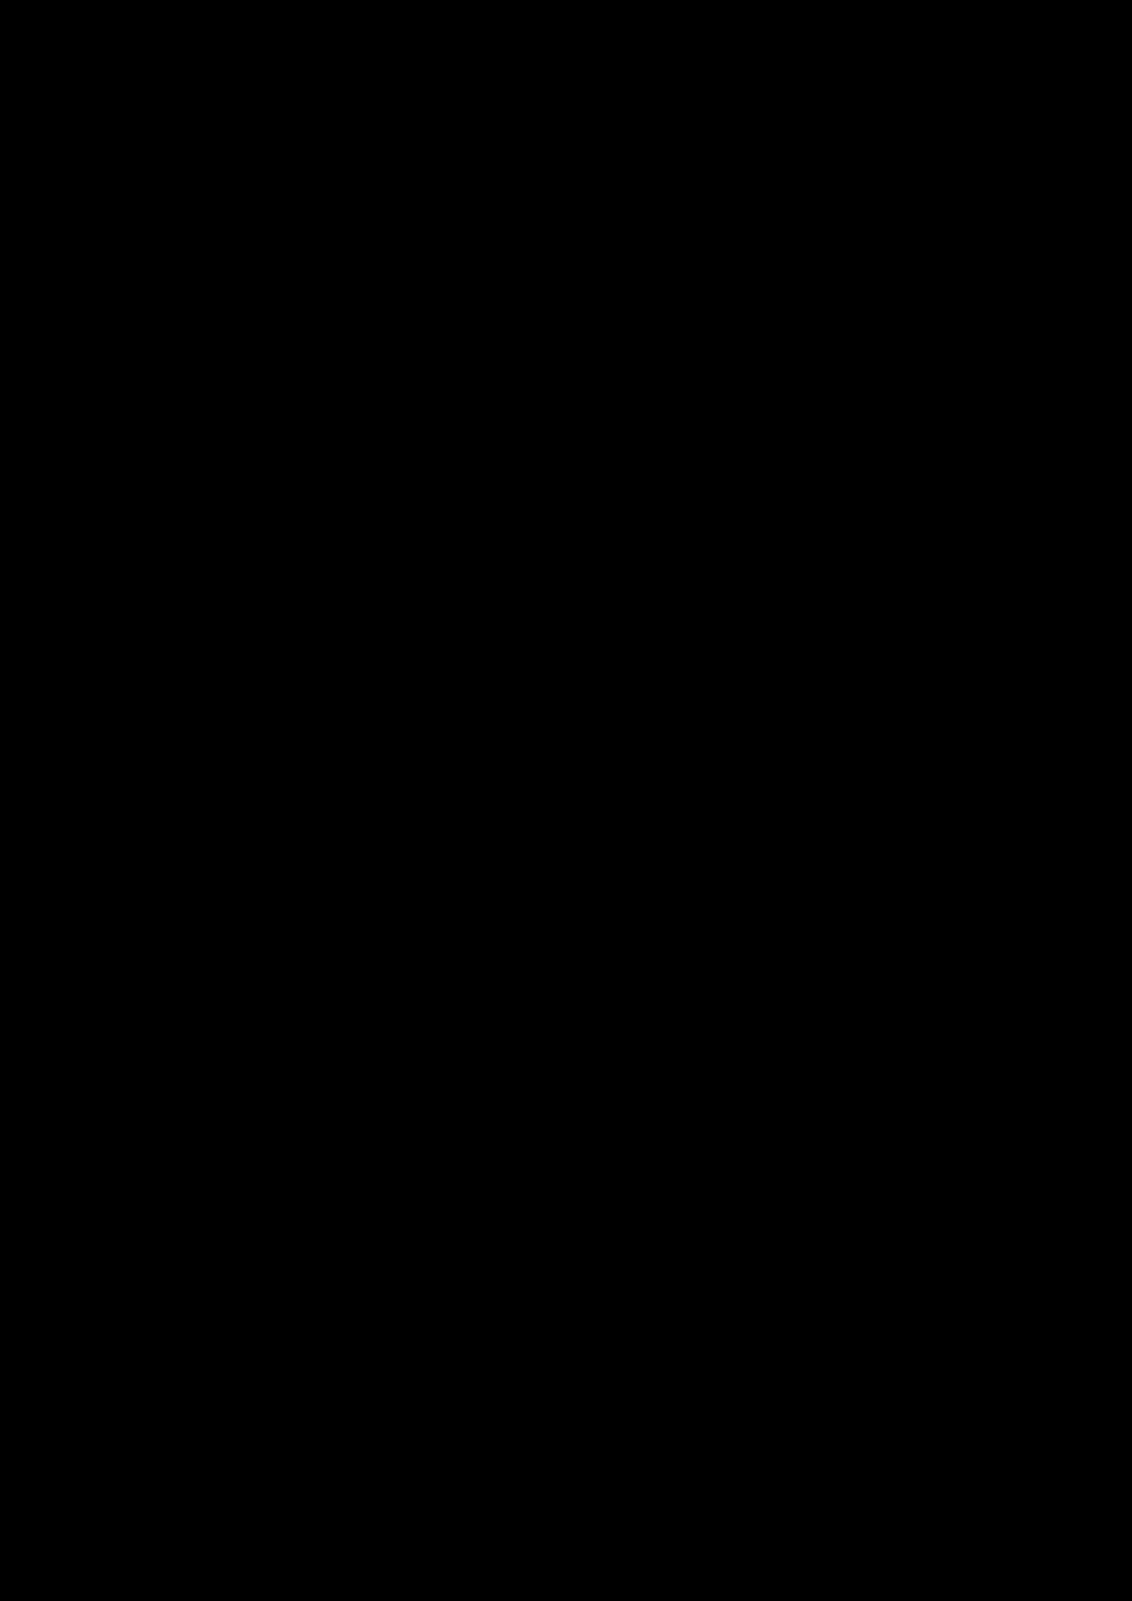 Korolevstvo slez slide, Image 61